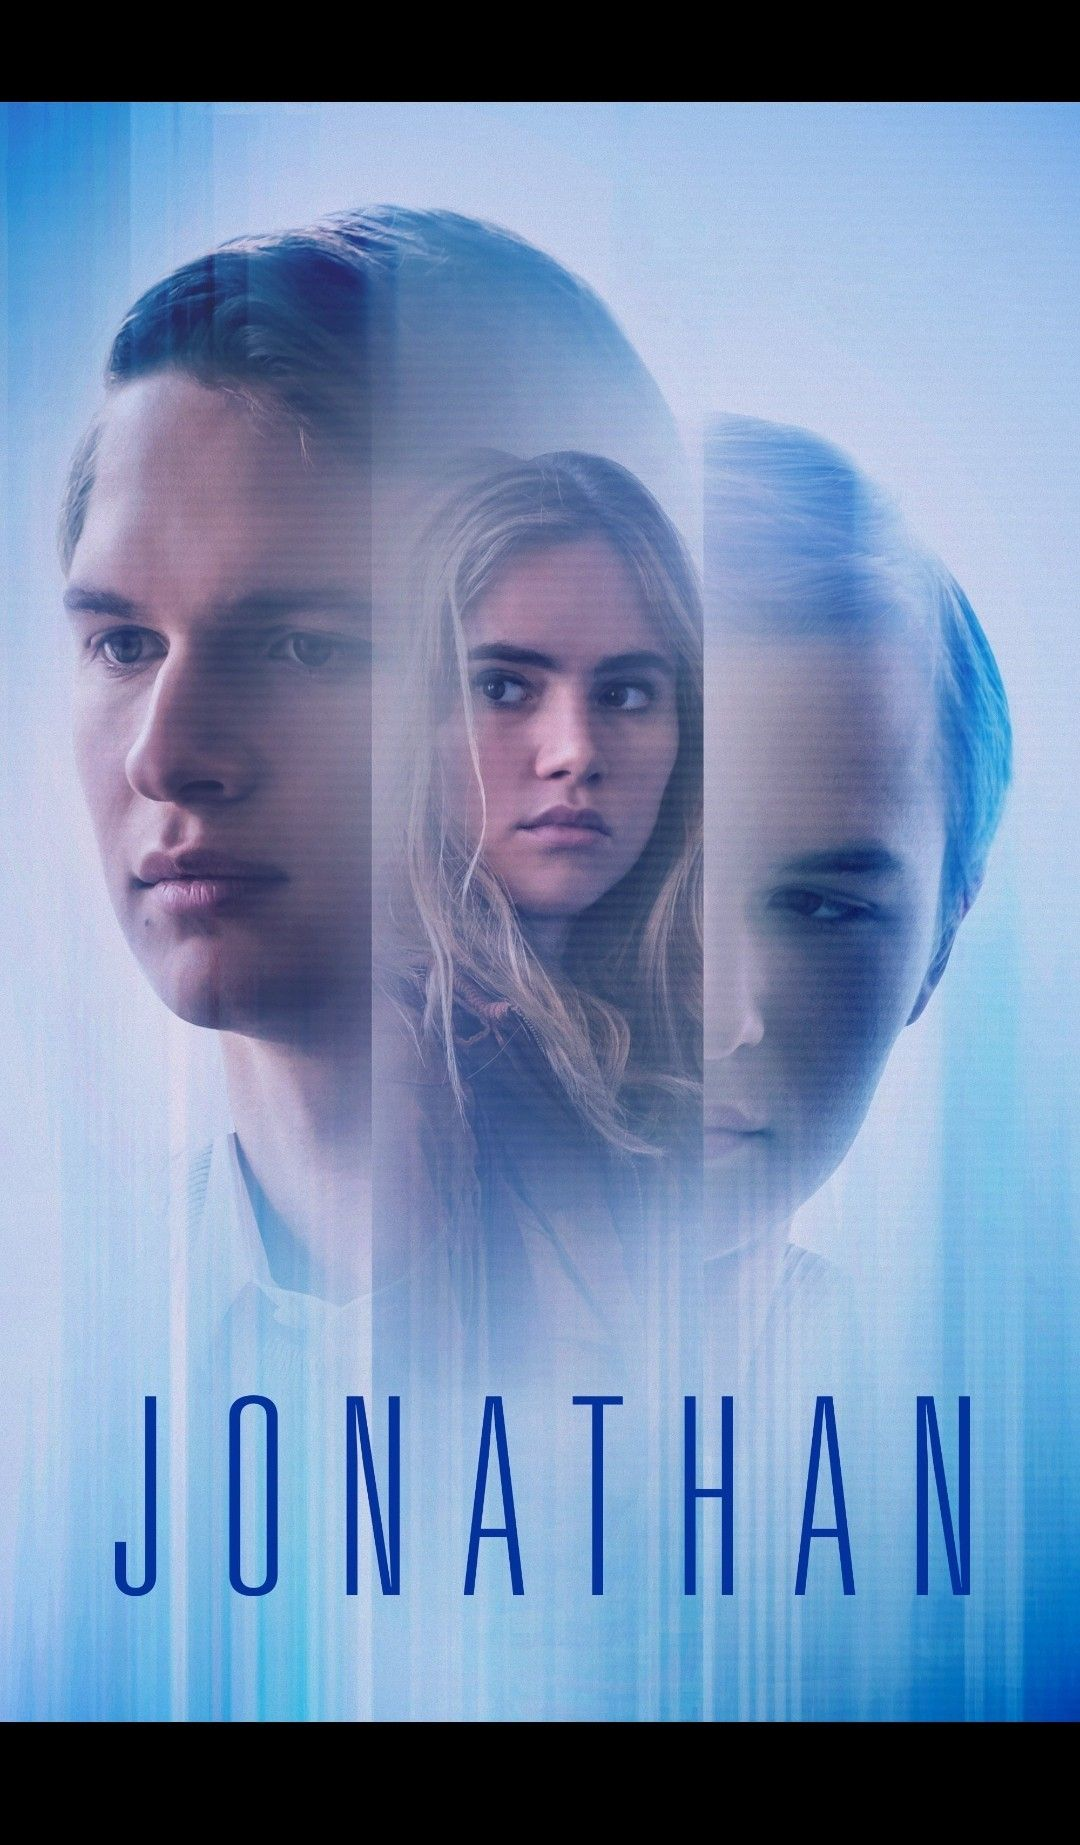 Jonathan Filme Stream Filme Deutsch Filme